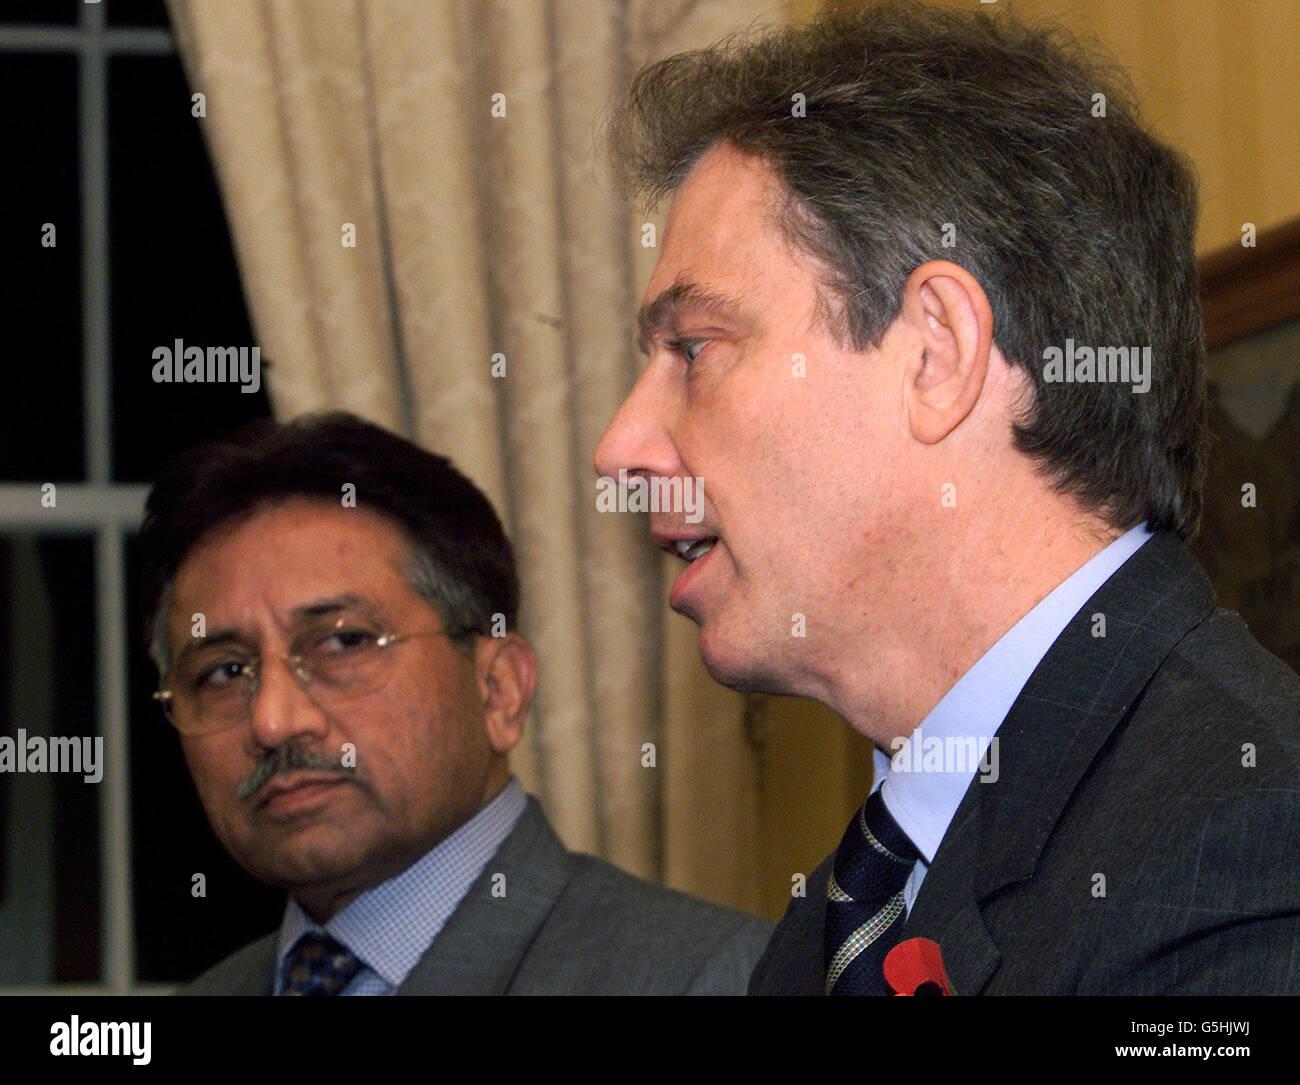 General Store Stock Photos General Store Stock Images: General Pervez Musharraf R Stock Photos & General Pervez